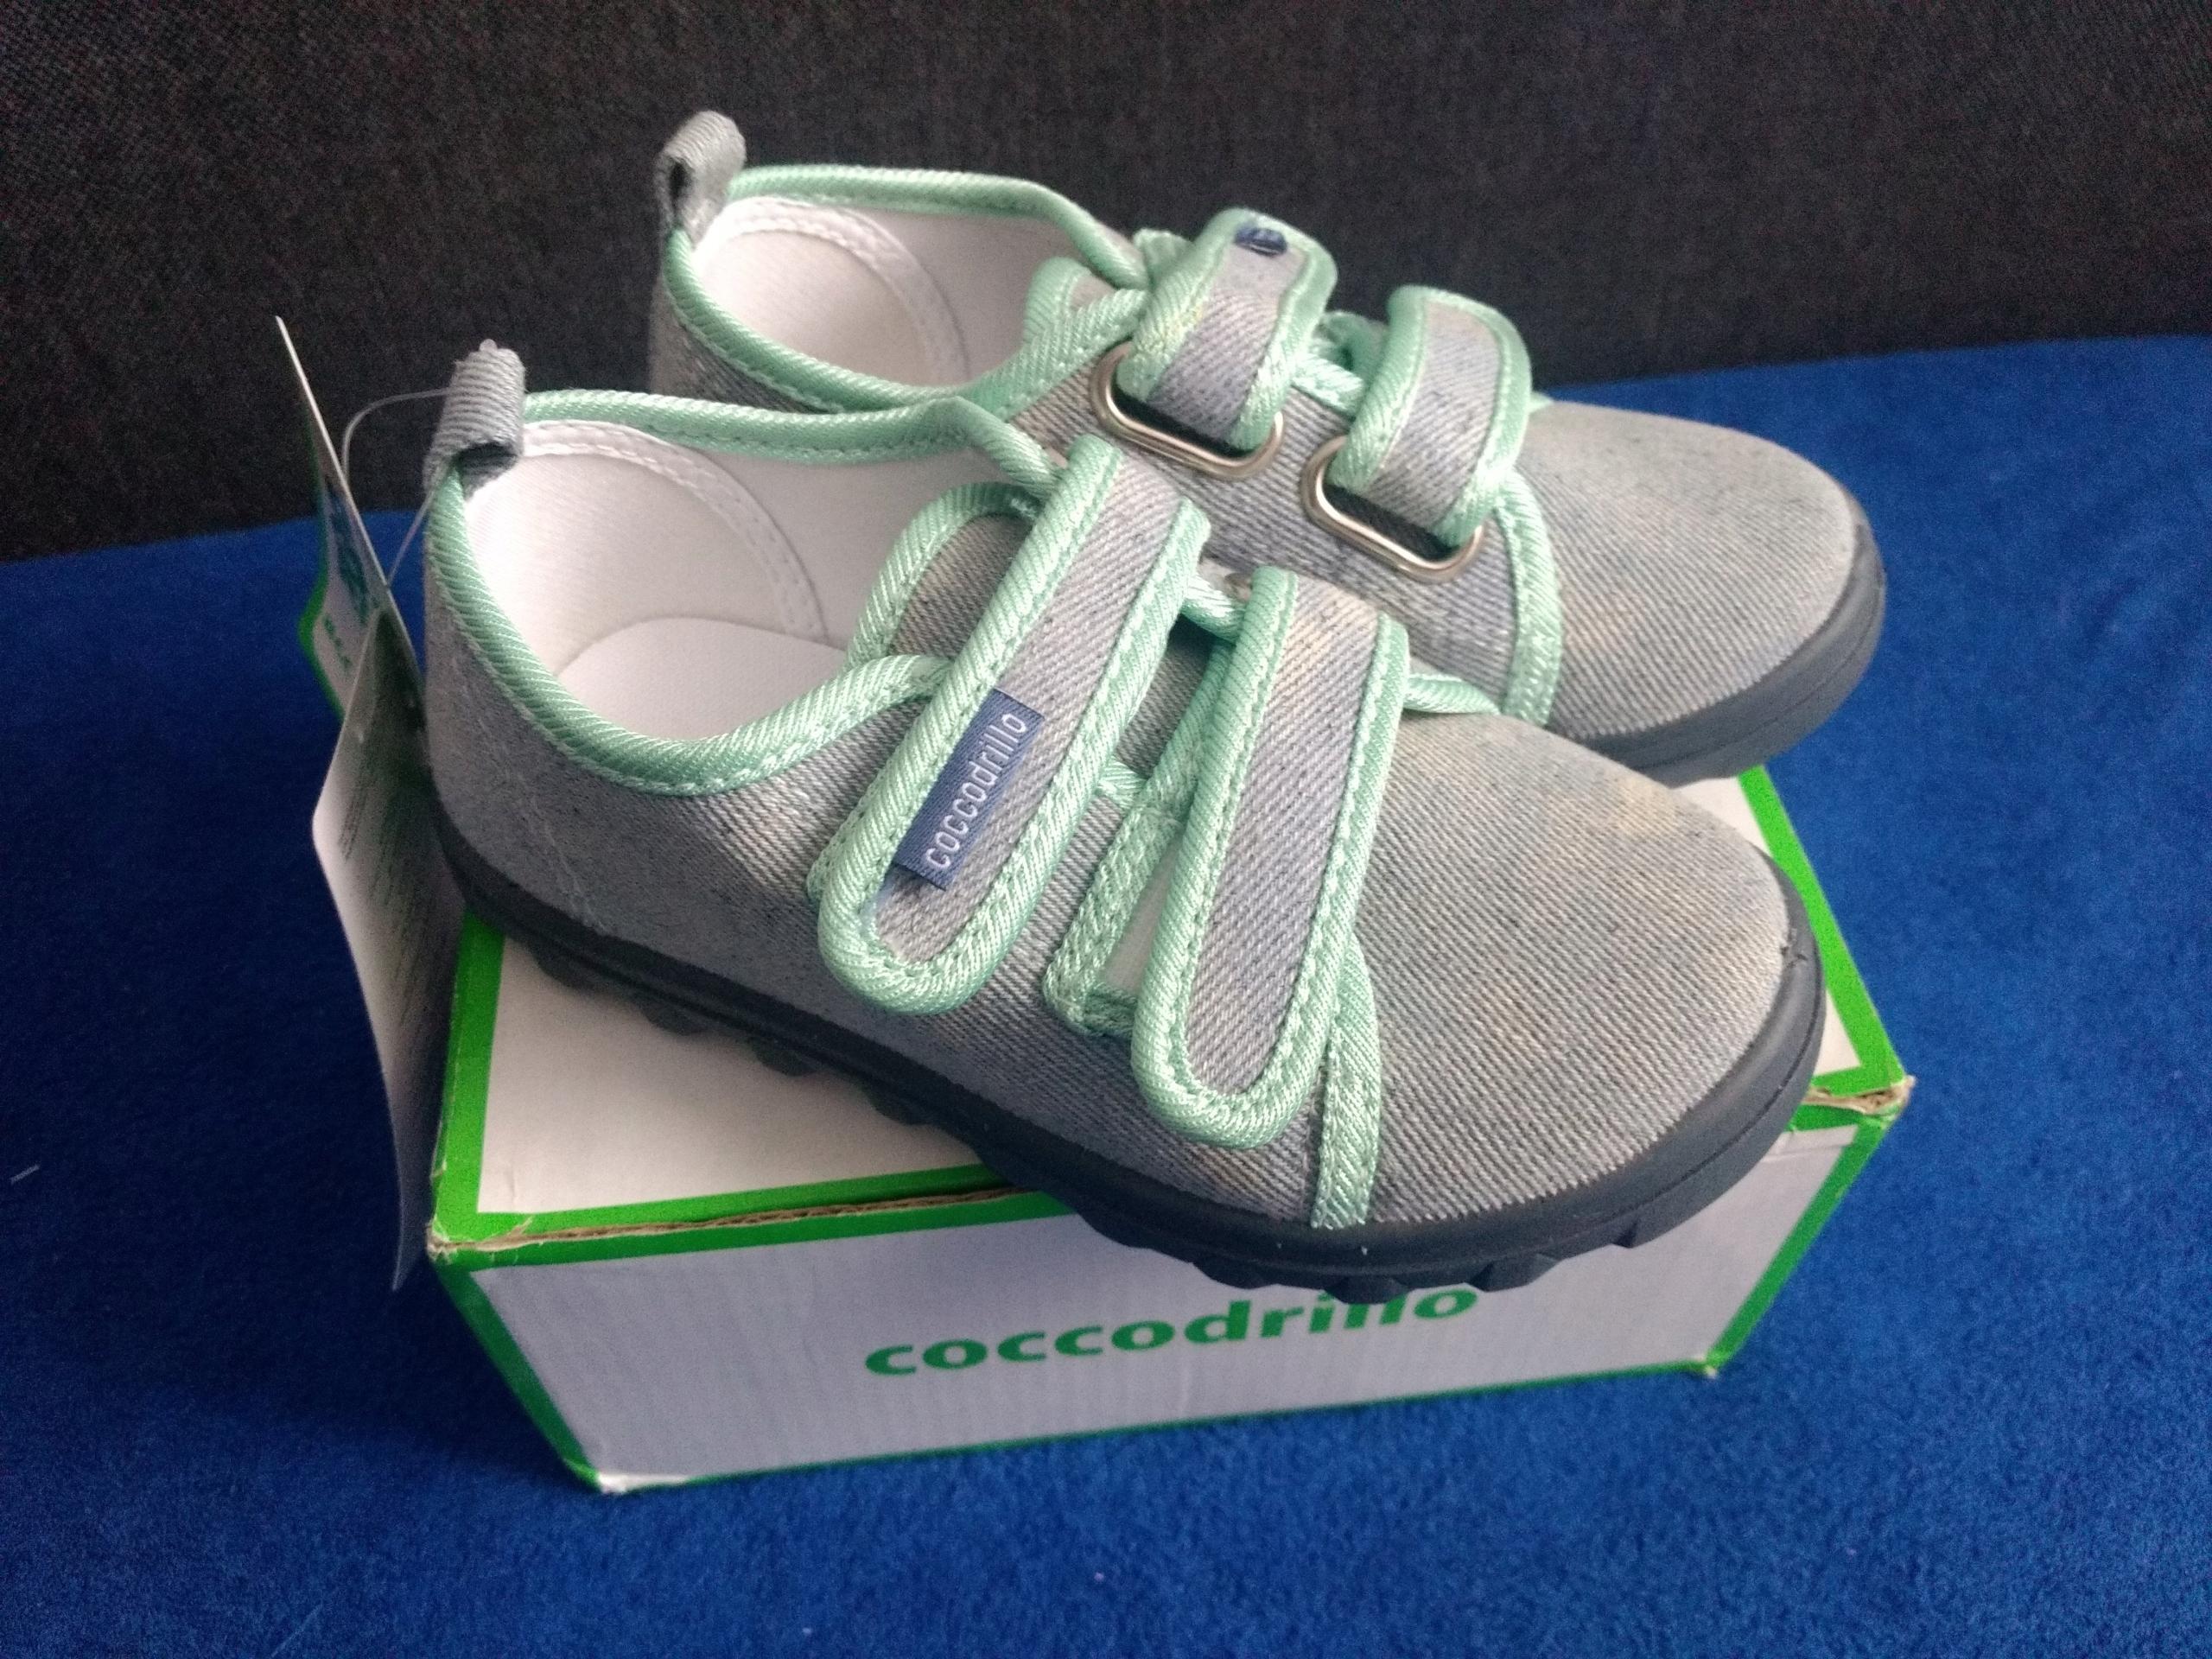 9010050d21381 Buty buciki tenisówki + trampki + COCCODRILLO + 27 - 7789994407 ...